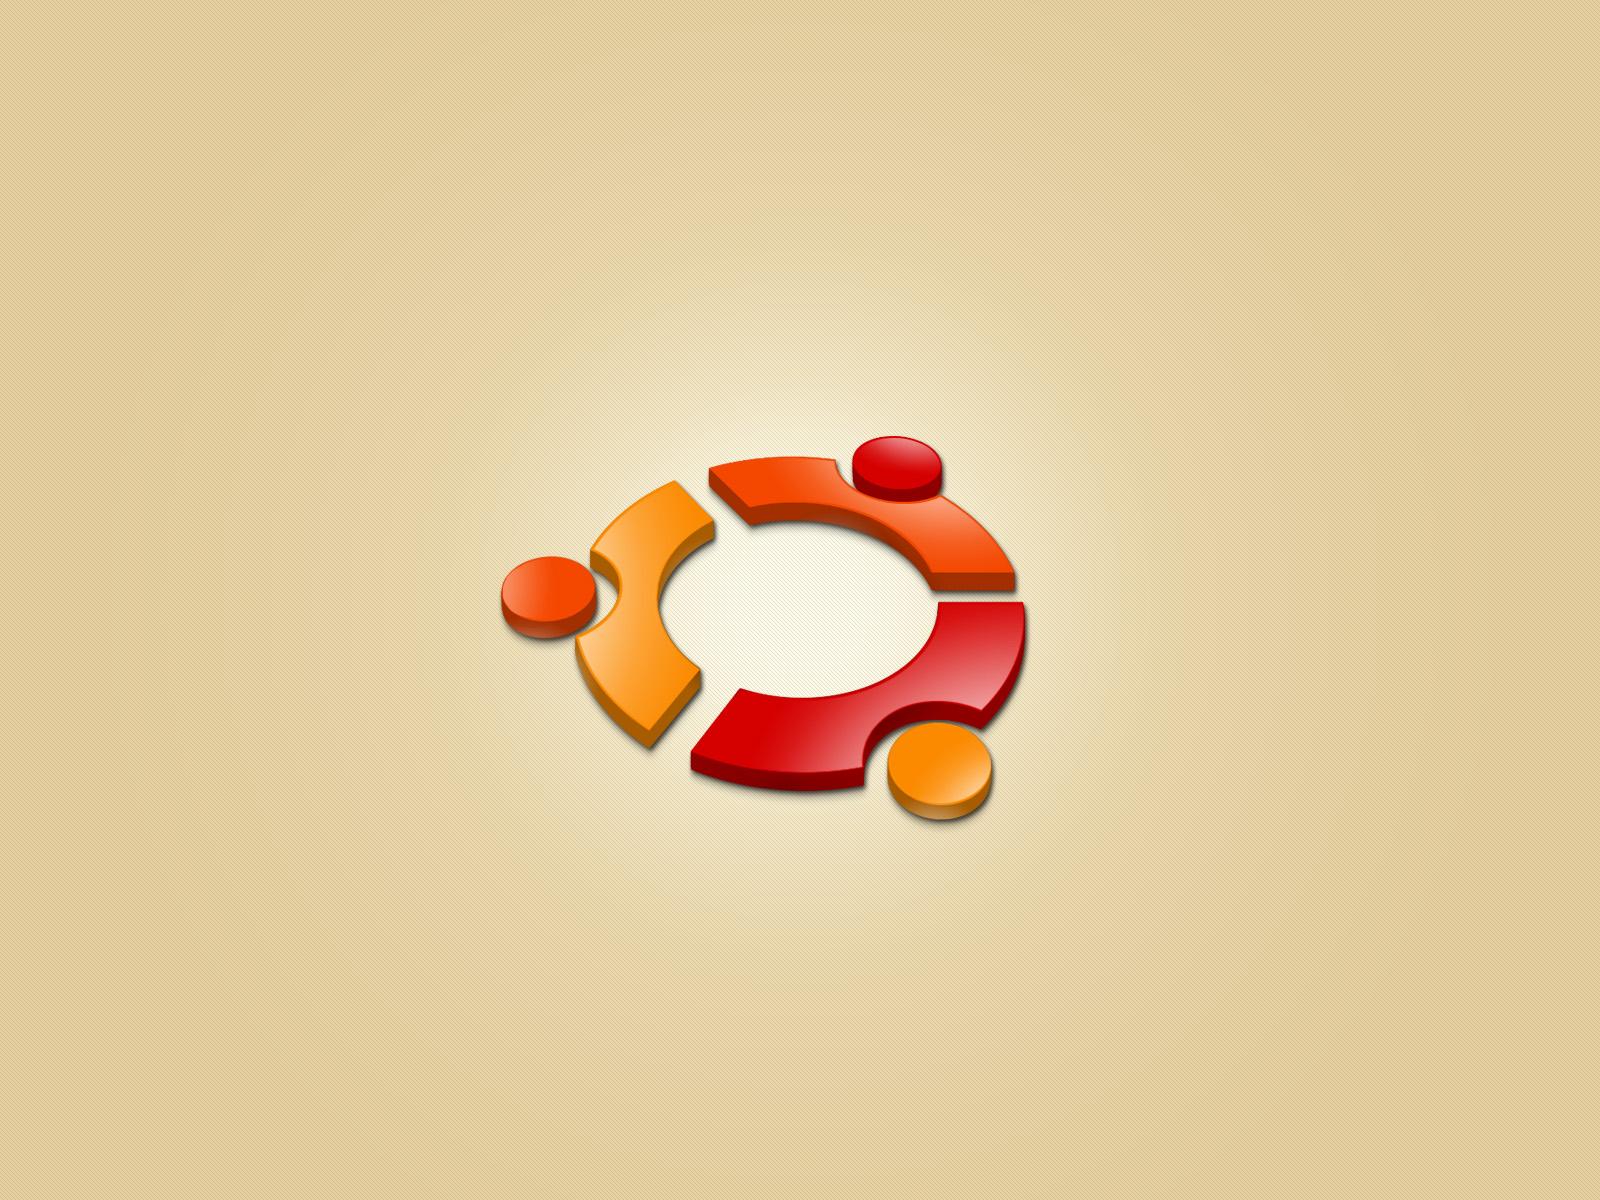 search decorate your desktop with ubuntu wallpapers Beautiful Ubuntu 1600x1200